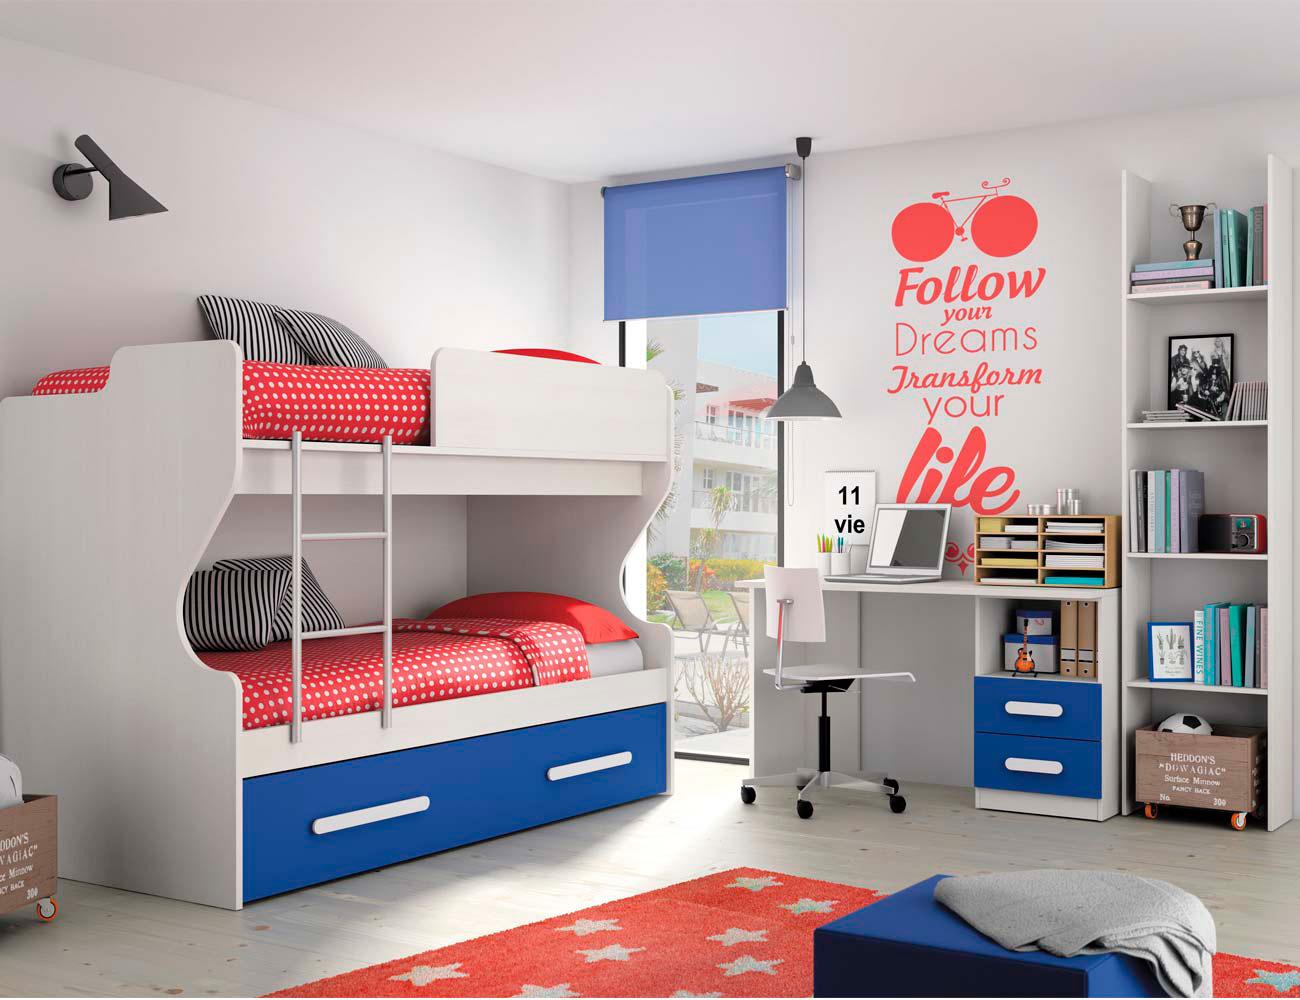 Composicion 310 dormitorio juvenil blanco azul marino